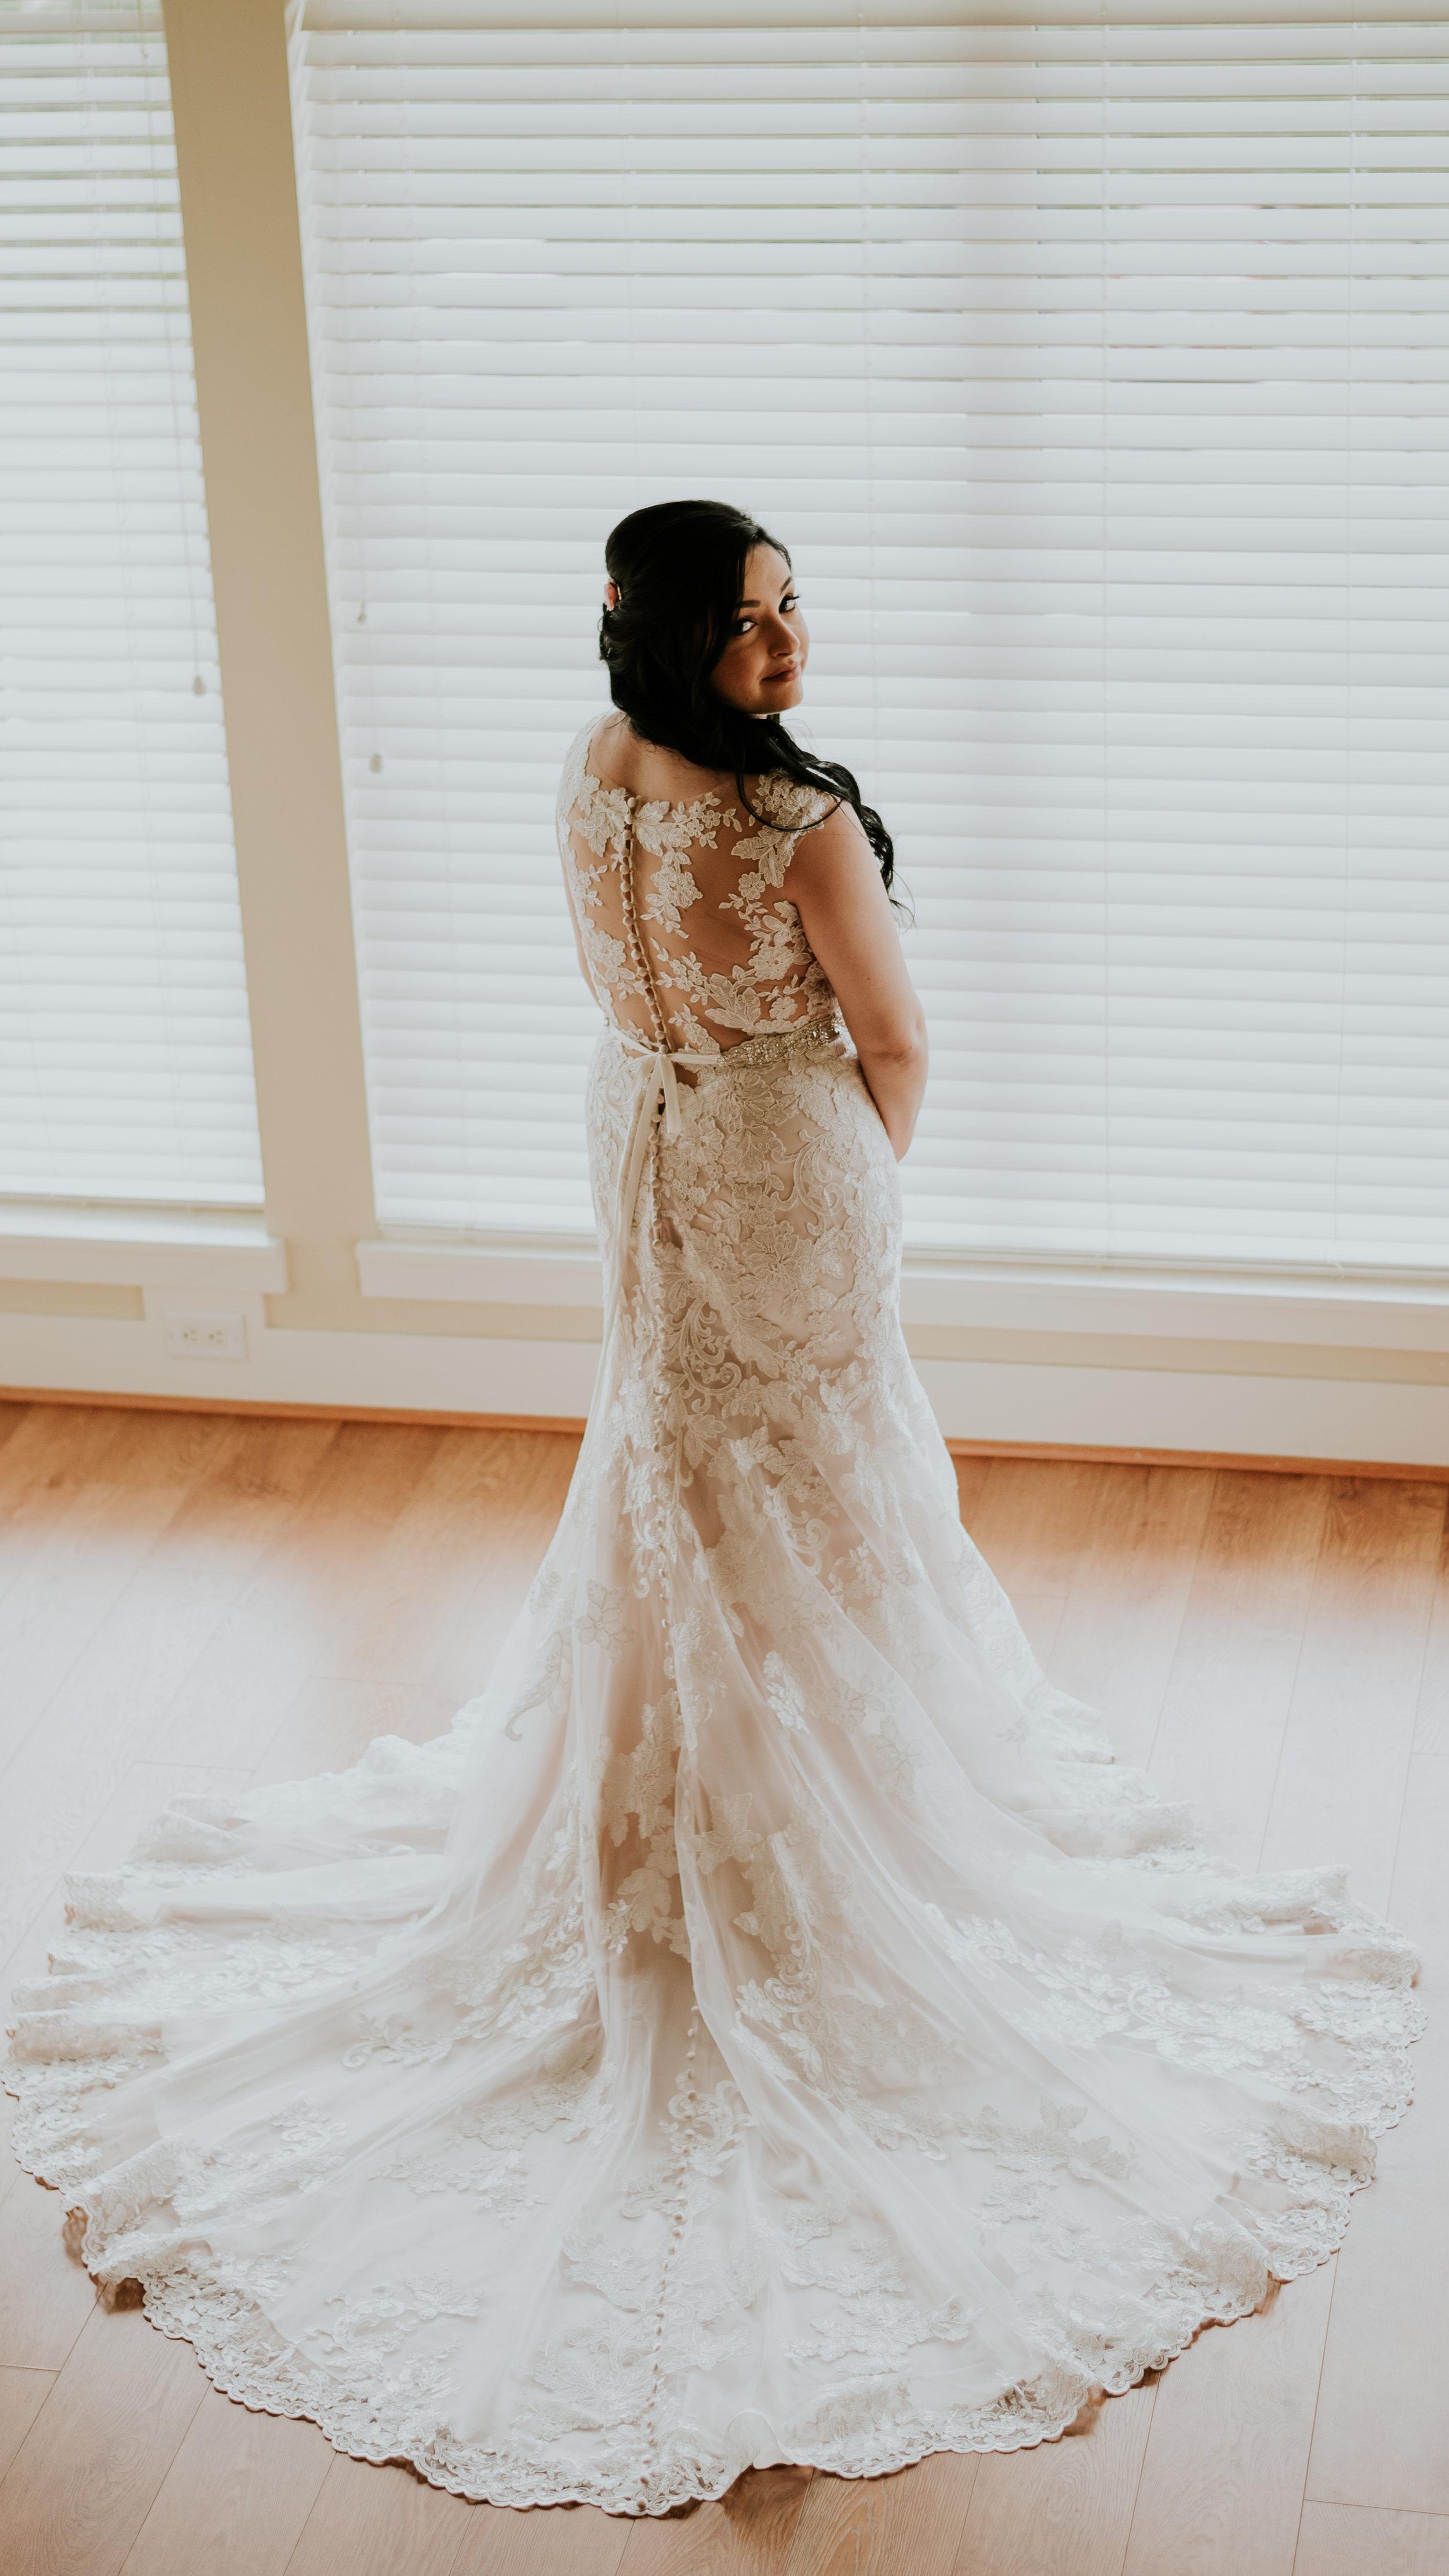 kelowna-wedding-photographer-33.jpg